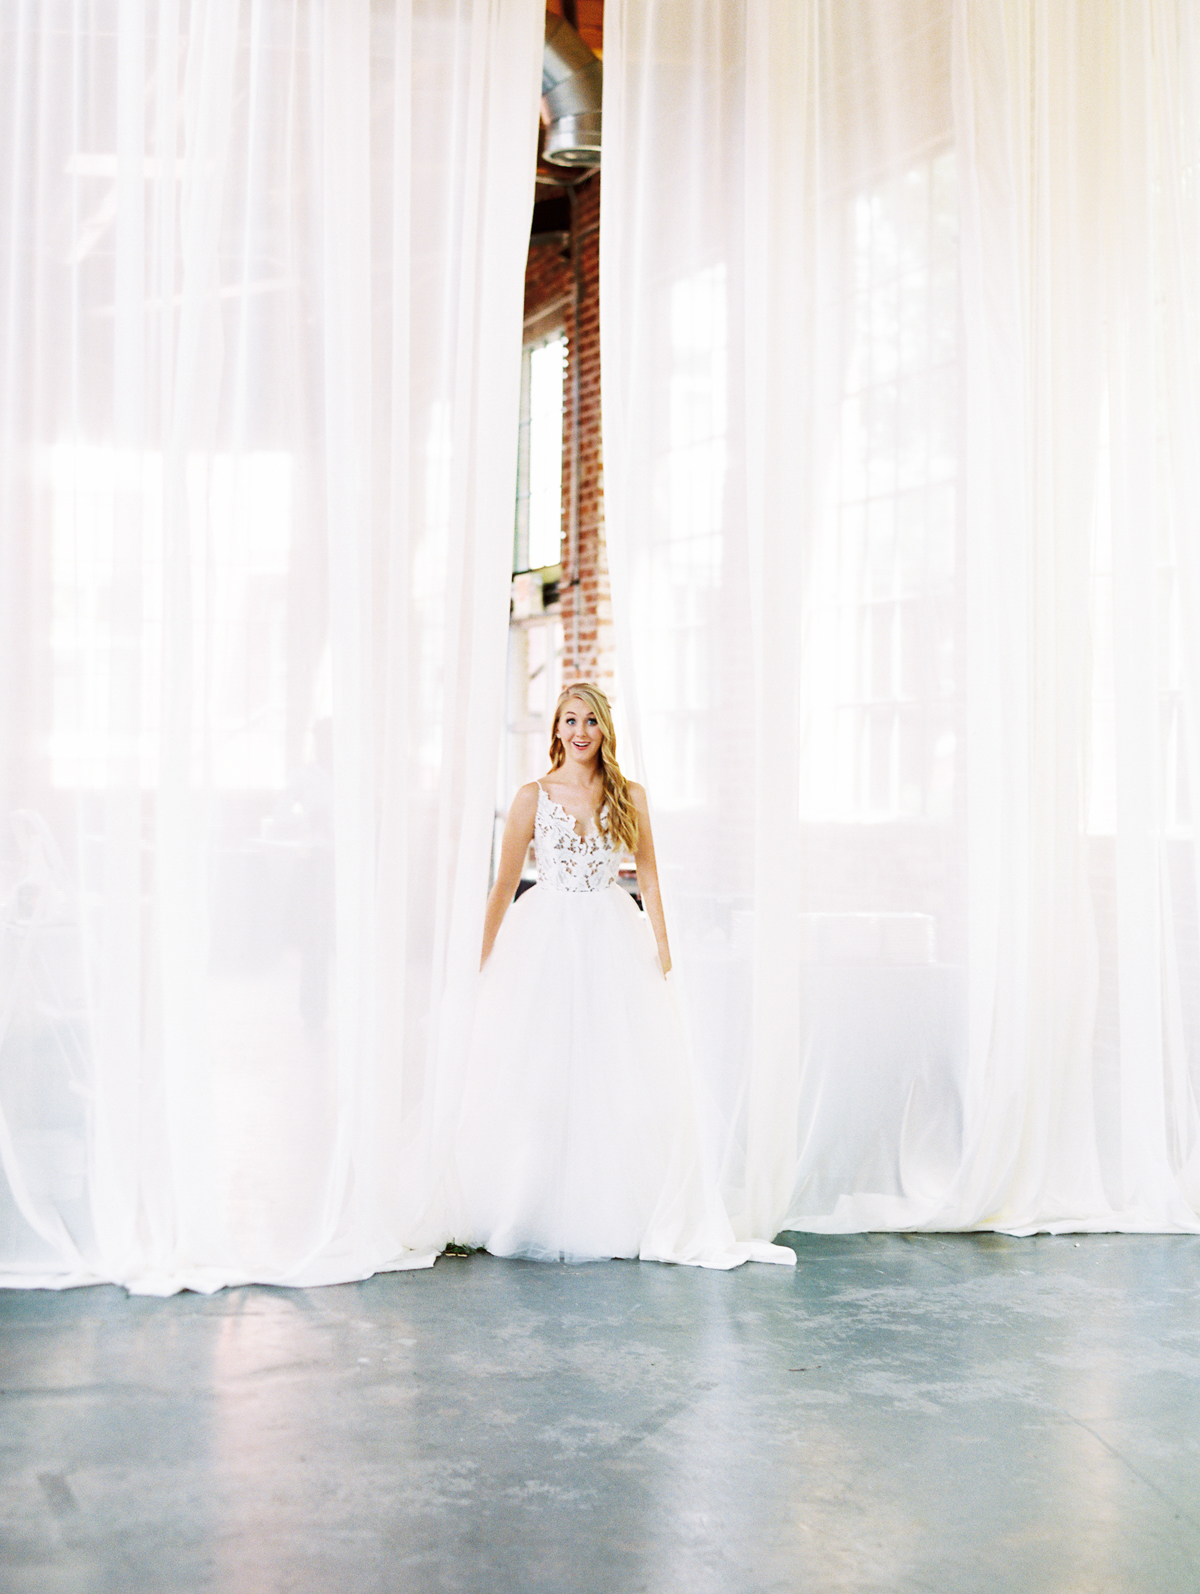 Foundry-At-Puritan-Mill-wedding-photos-venue-atlanta-fine-art-film-photographer15.JPG